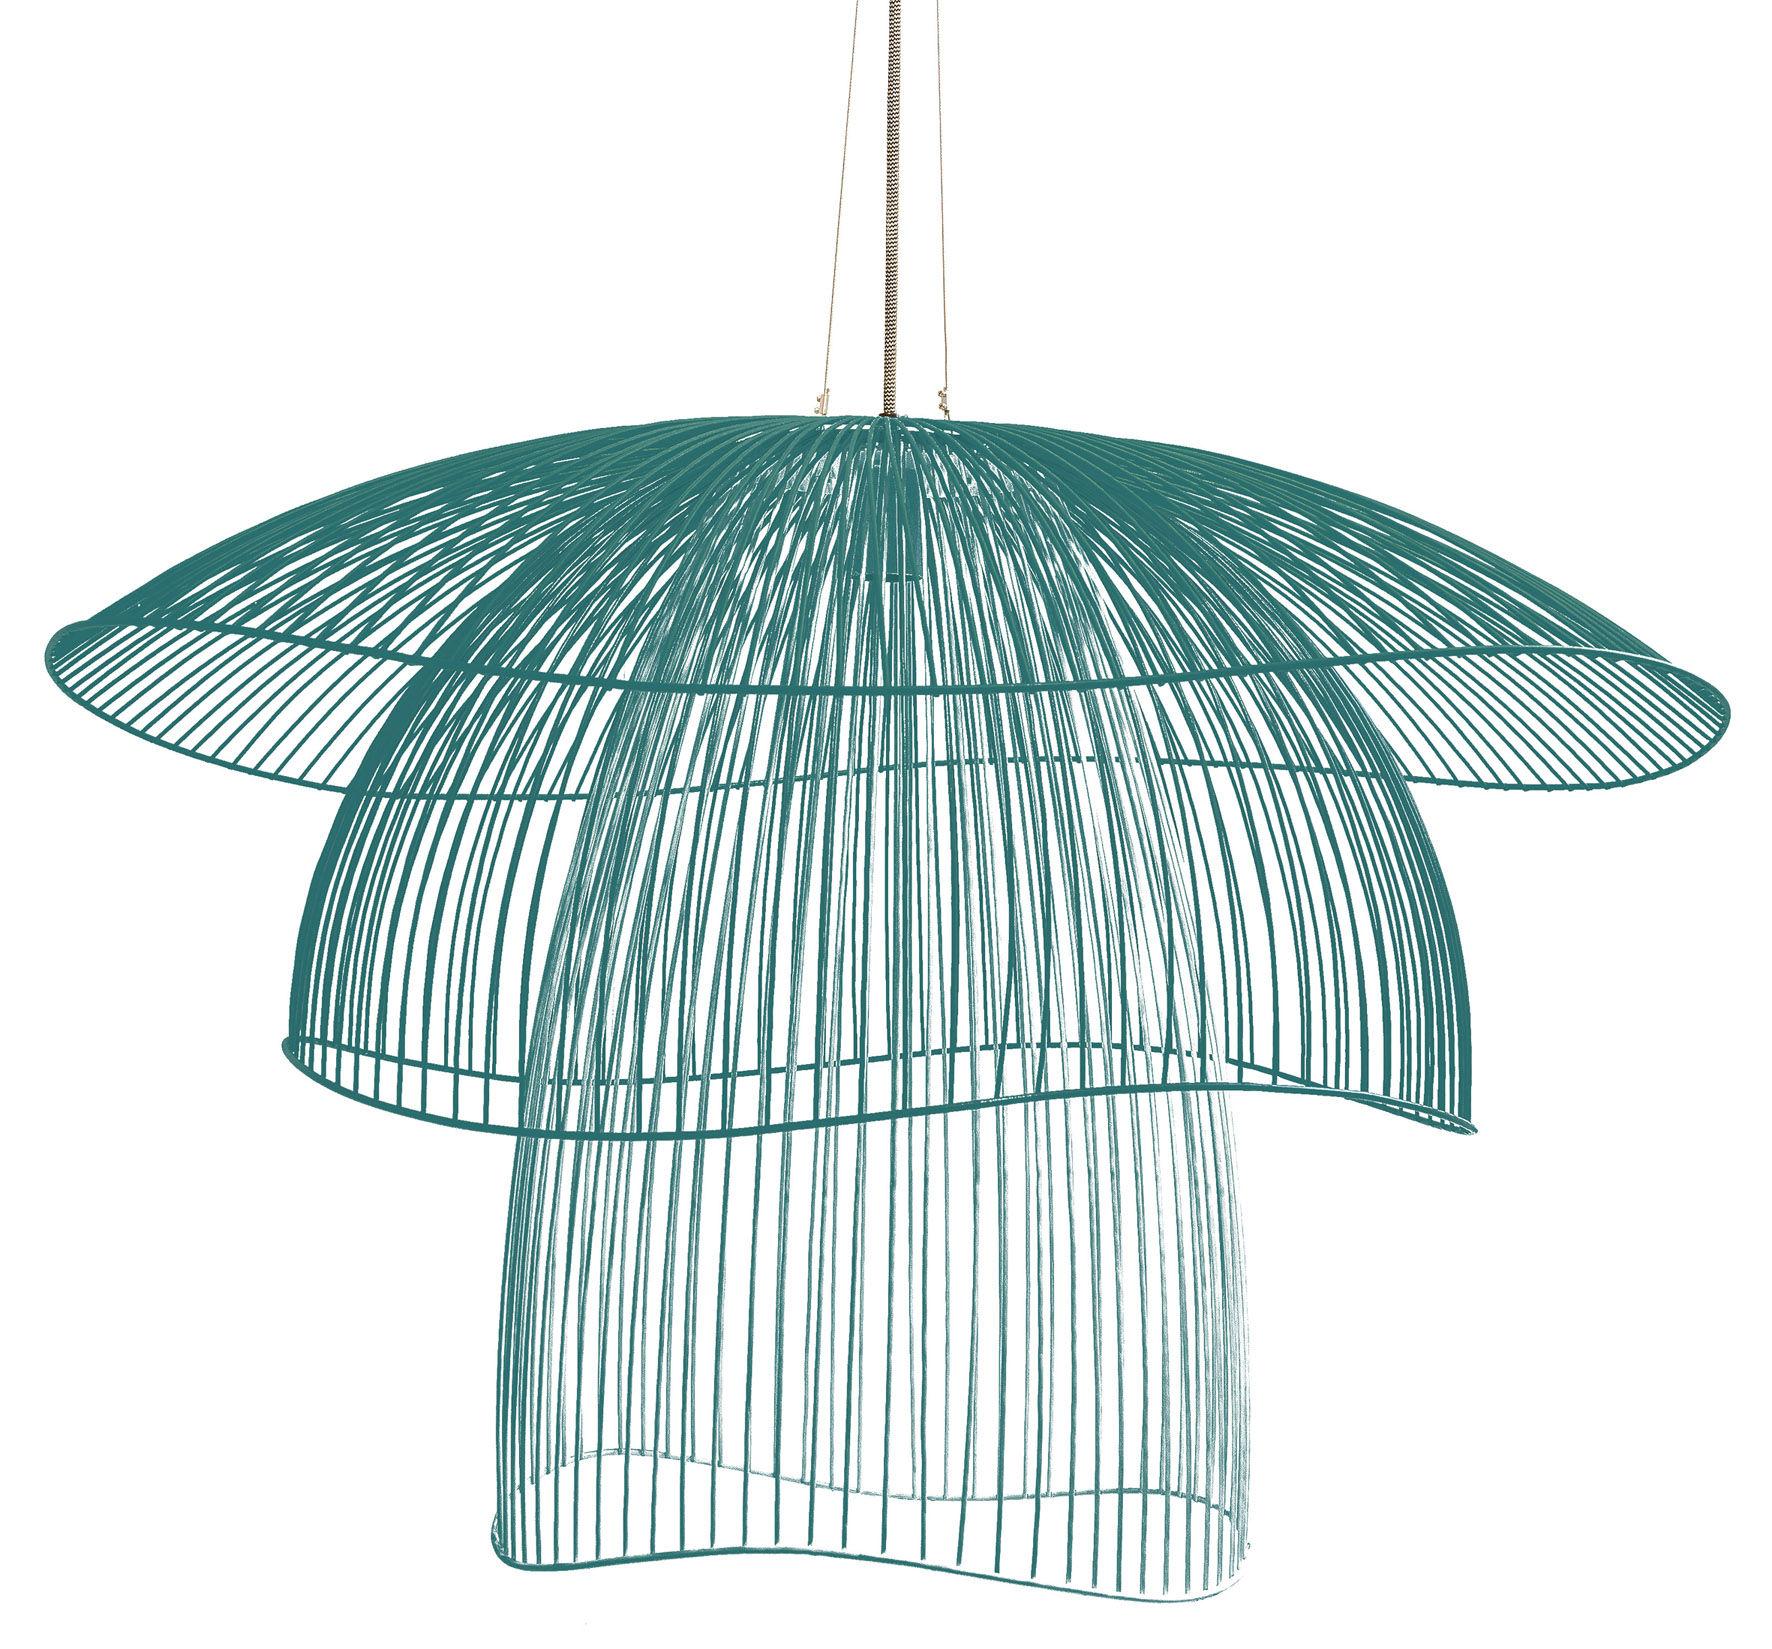 Lighting - Pendant Lighting - Papillon Large Pendant - Ø 100 cm by Forestier - Grey Blue - Powder coated steel